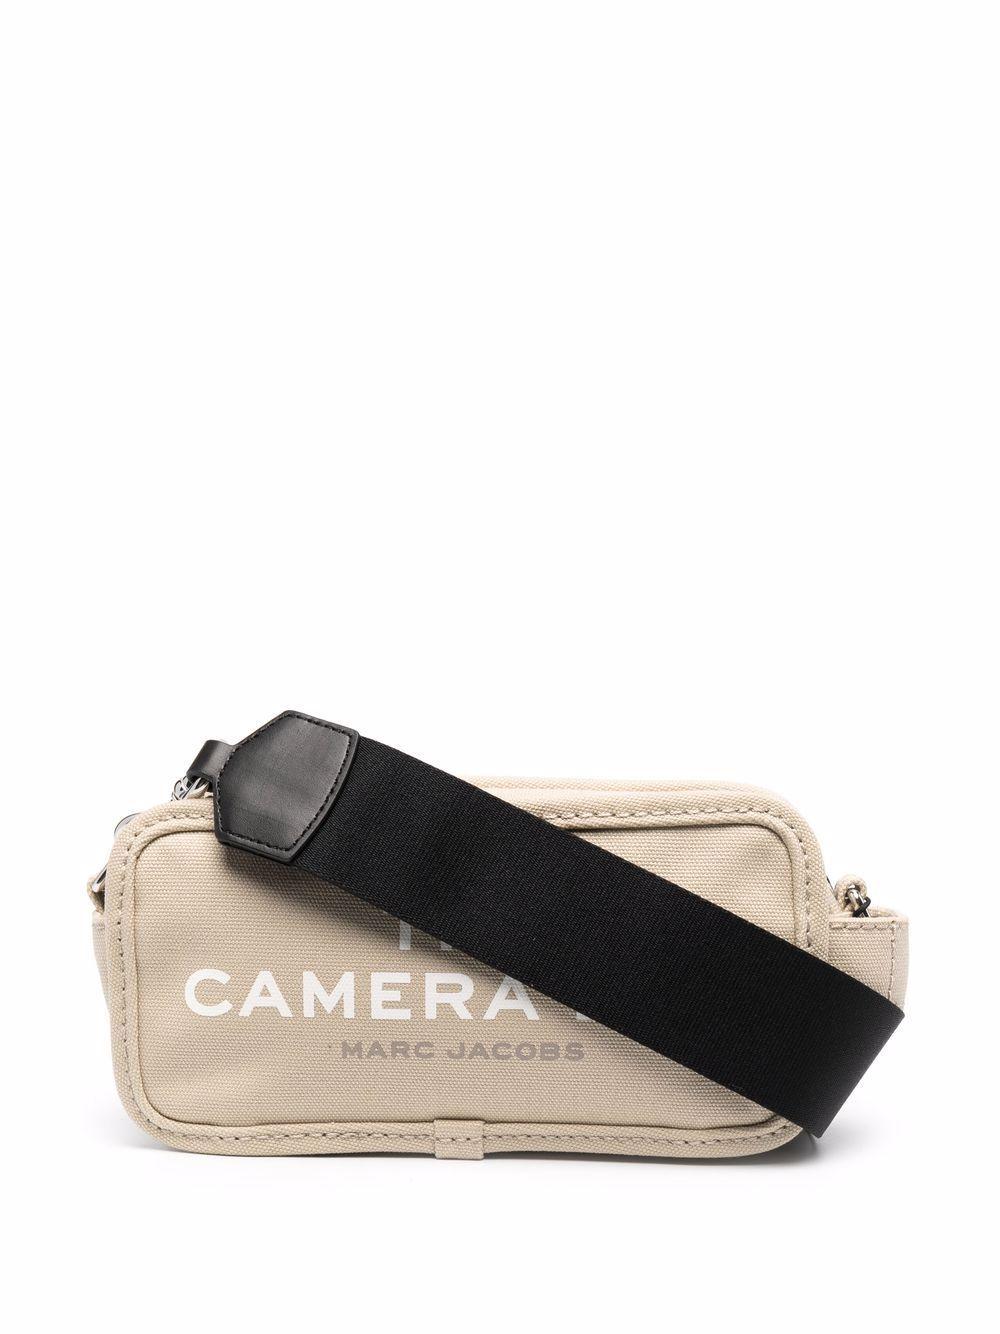 Camera bag in cotone